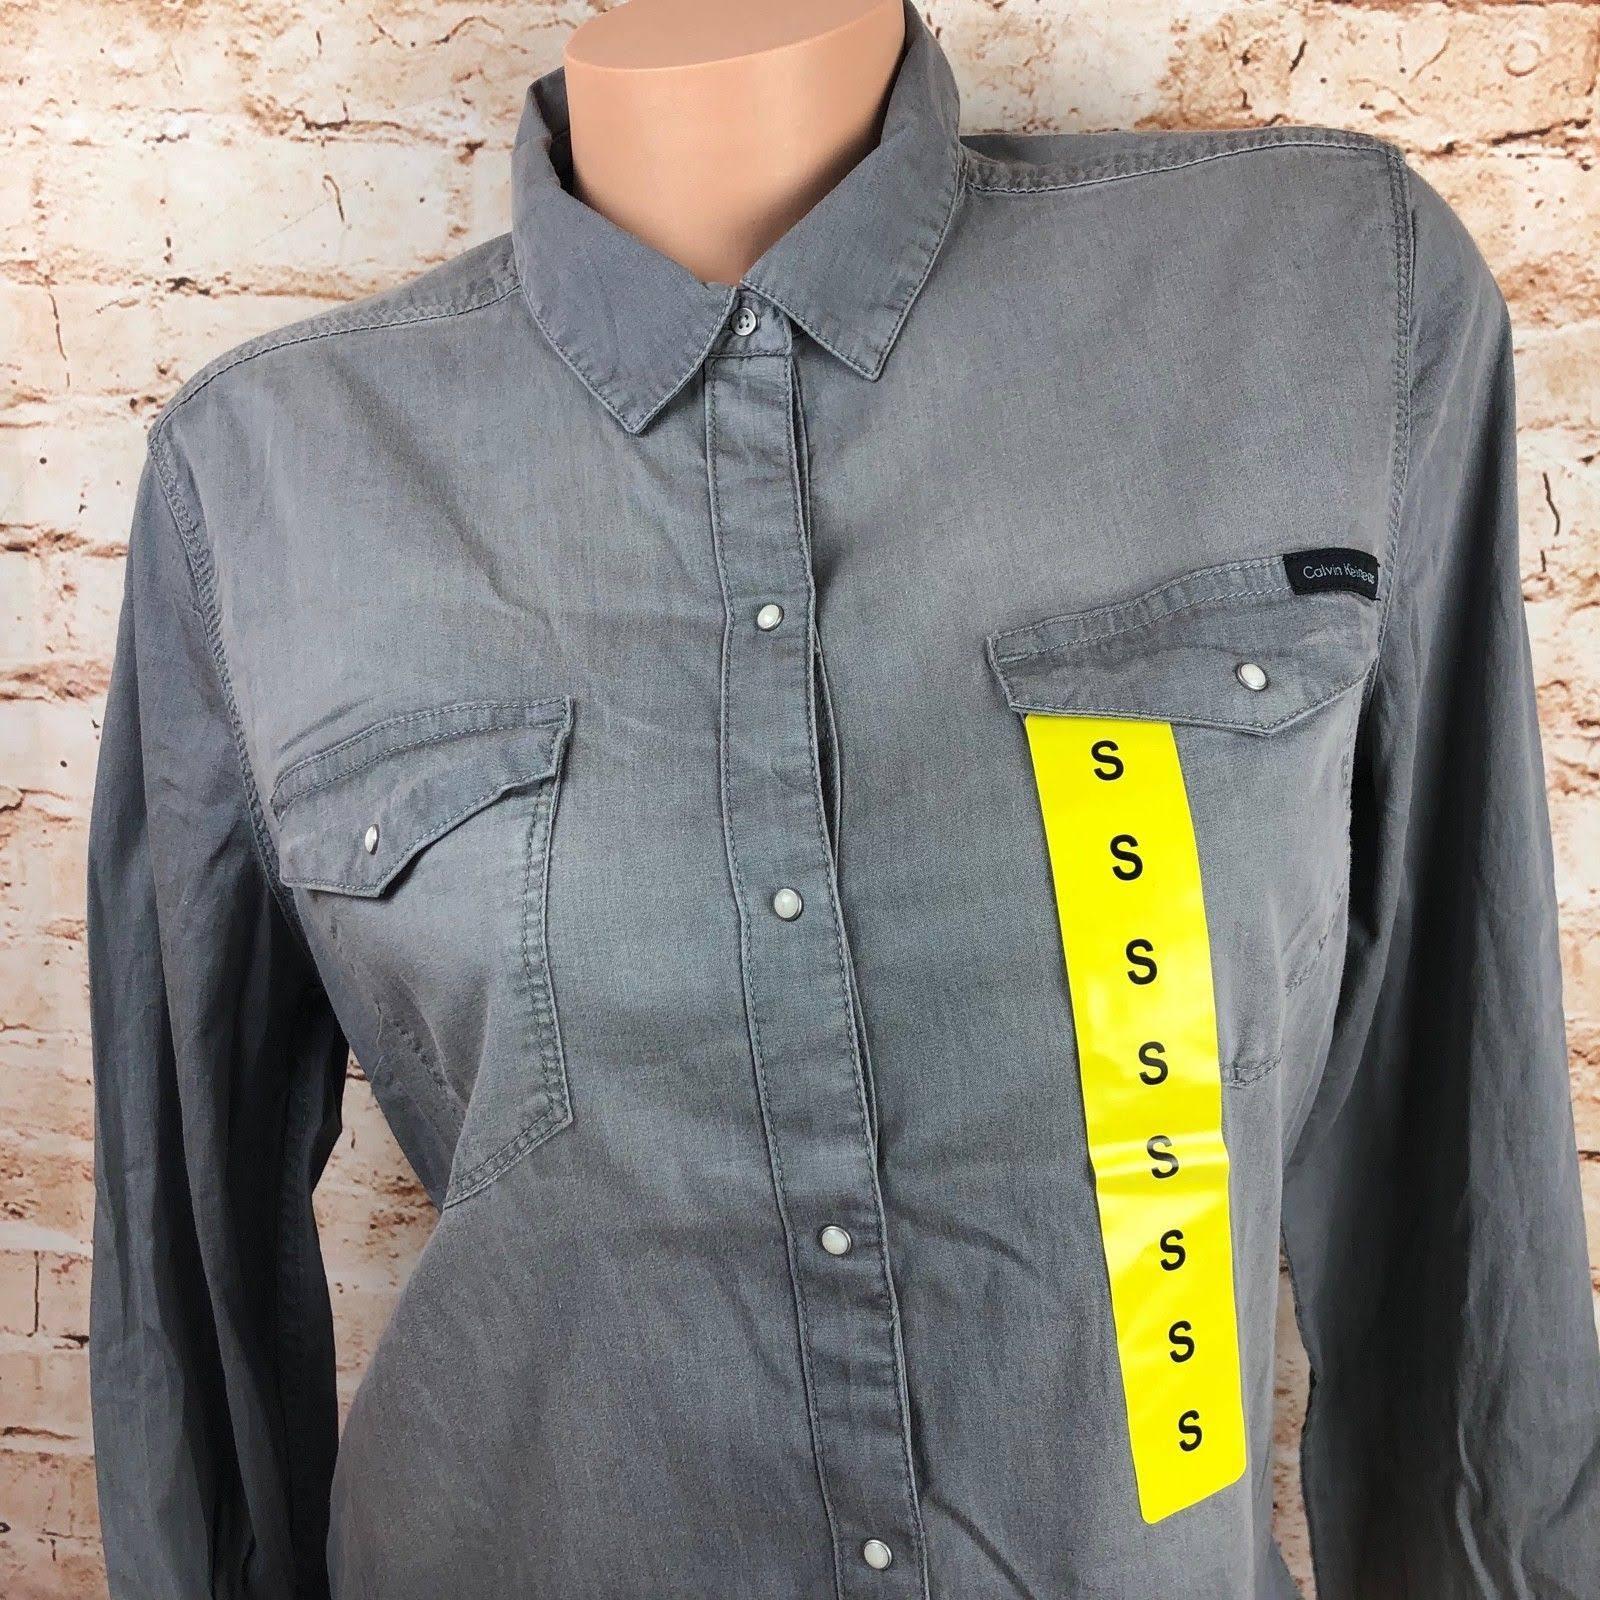 Mujer Larga Klein En Con Camisa Aleesa Botones Denim Calvin Manga Jeans De Grey vTUWWAq